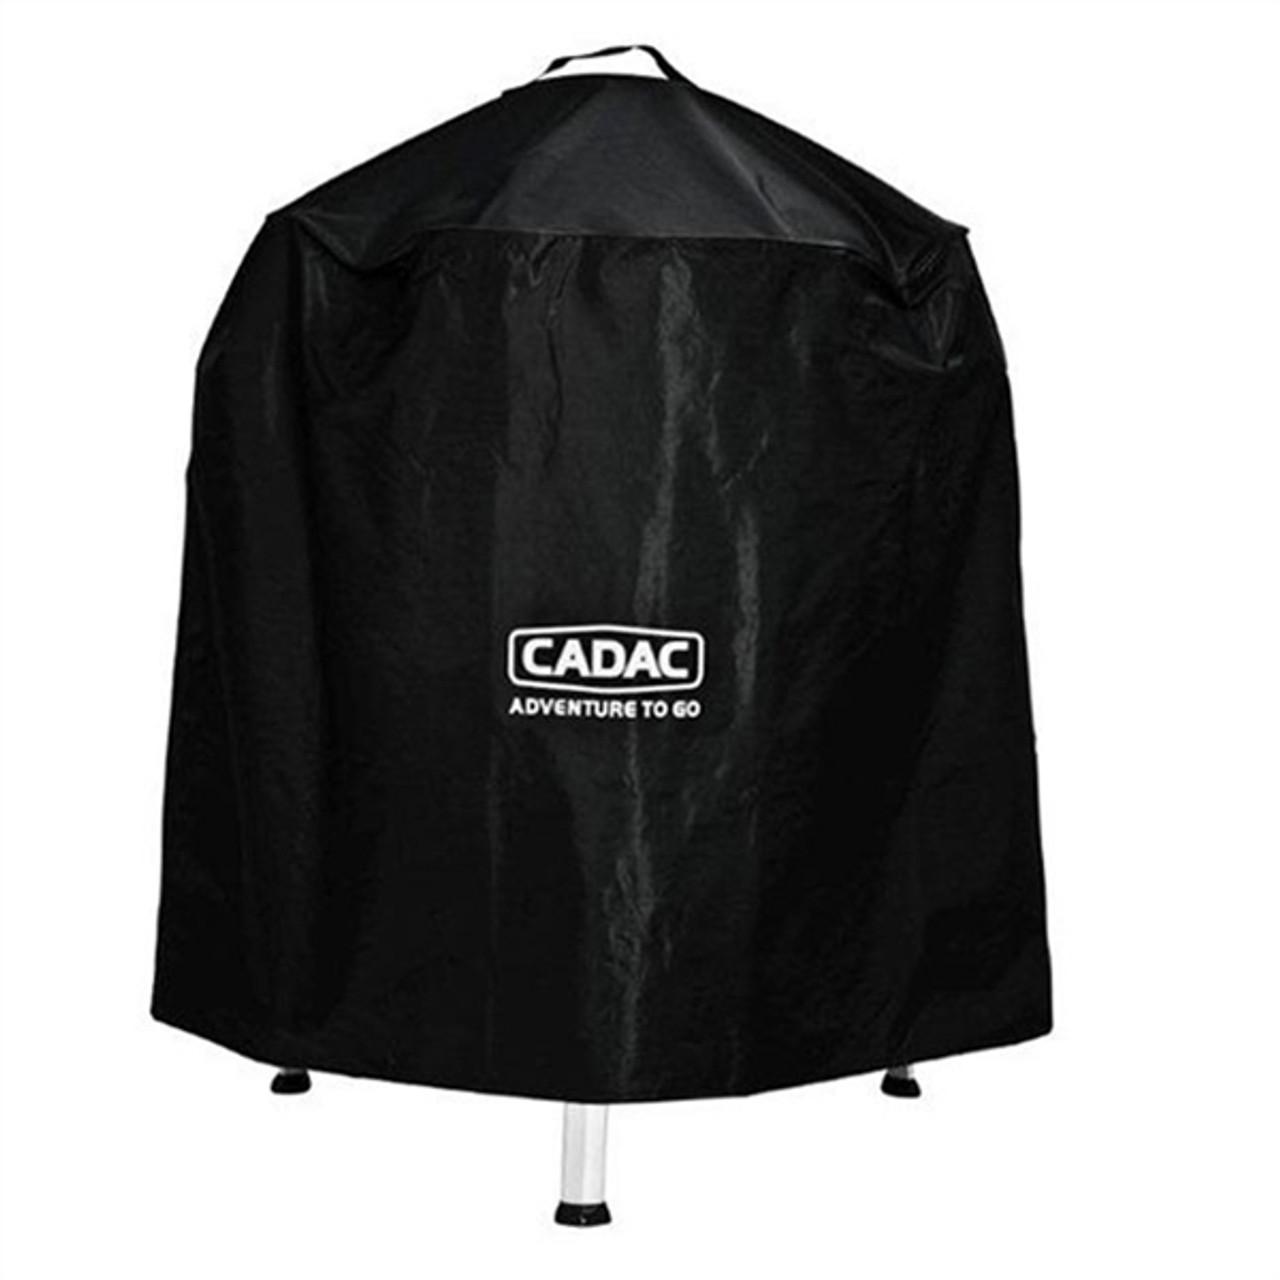 Cadac Paella Pan 47 Cm.Cadac 47cm Bbq Cover From Camperite Leisure Order Now